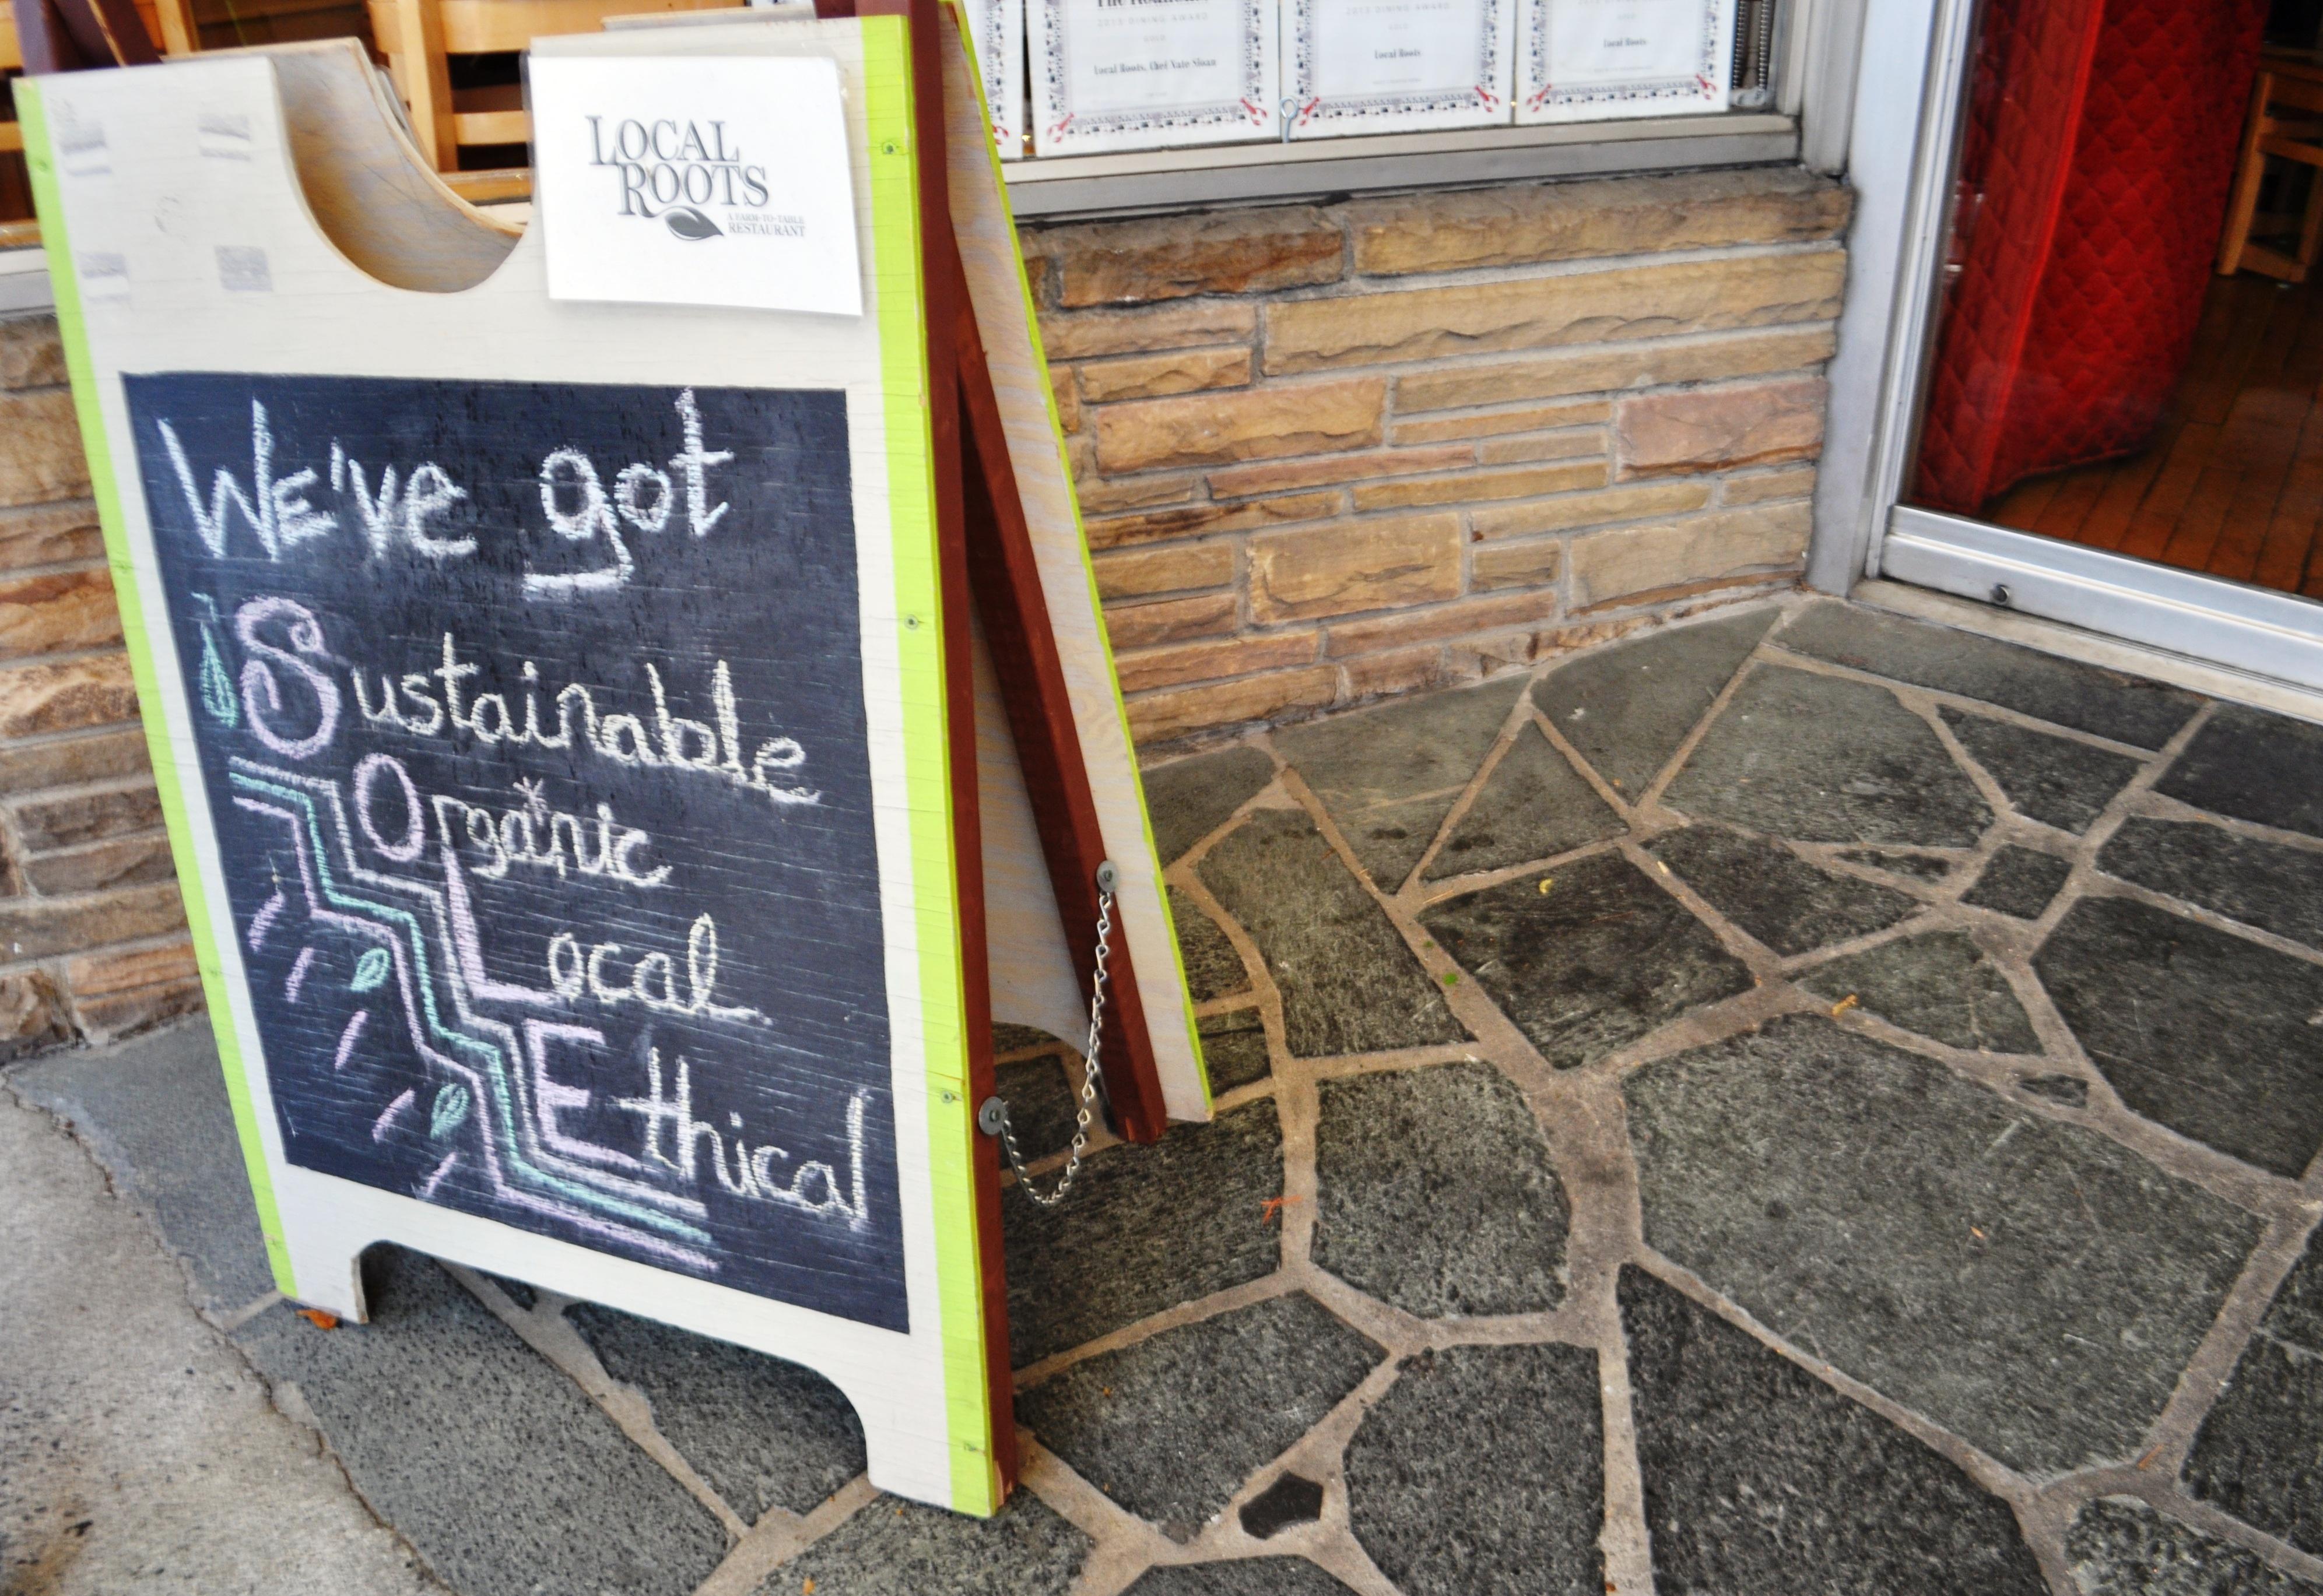 Local Roots Restaurant, Roanoke, VA, April 2014 #OldSchoolVA #LoveVA